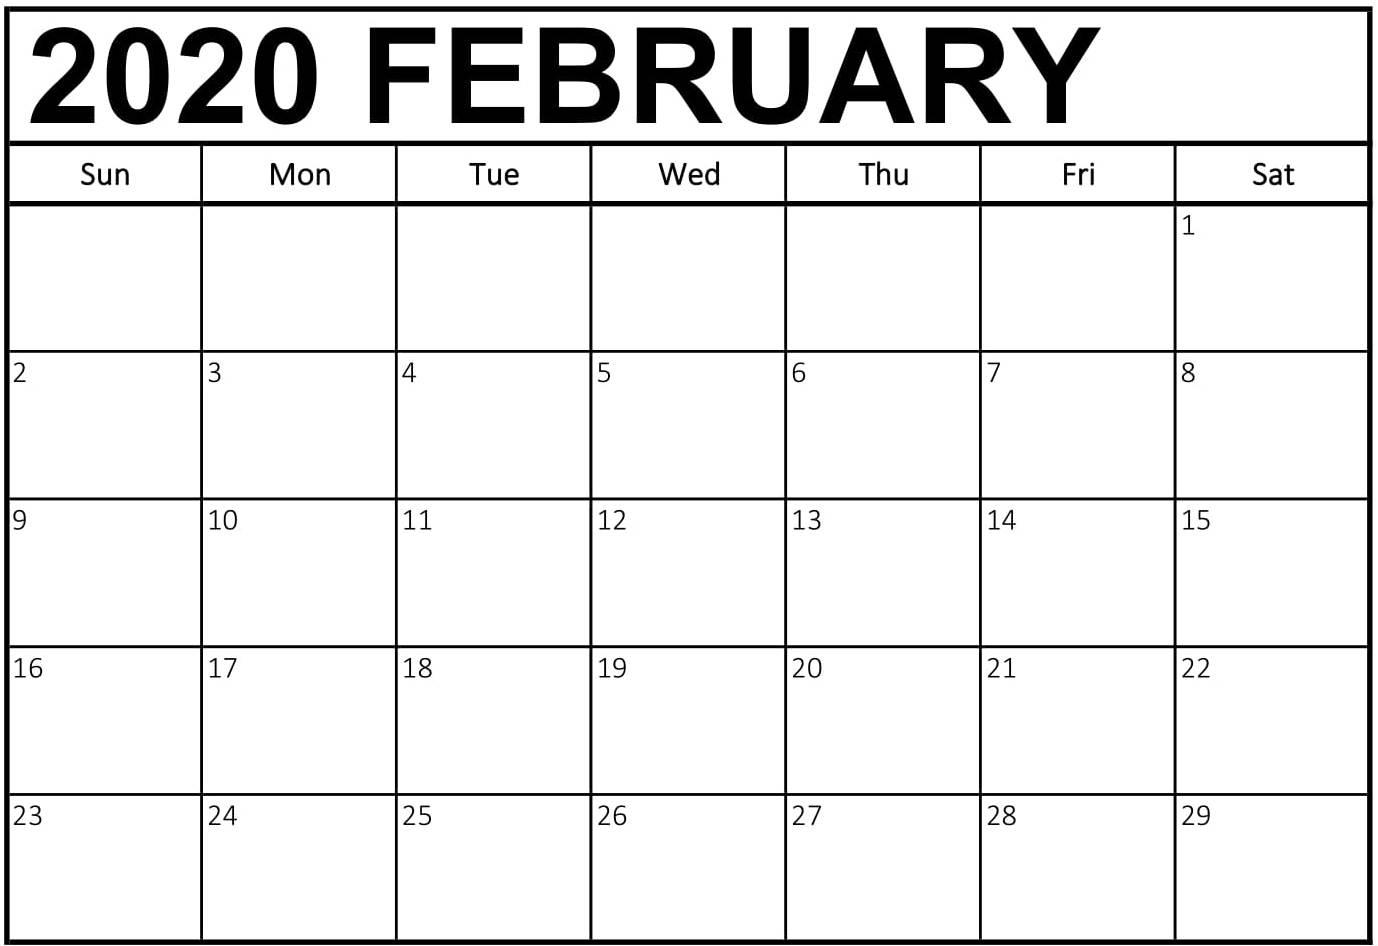 Free February 2020 Calendar Australia Holidays Printable intended for Calendar 2020 Australia